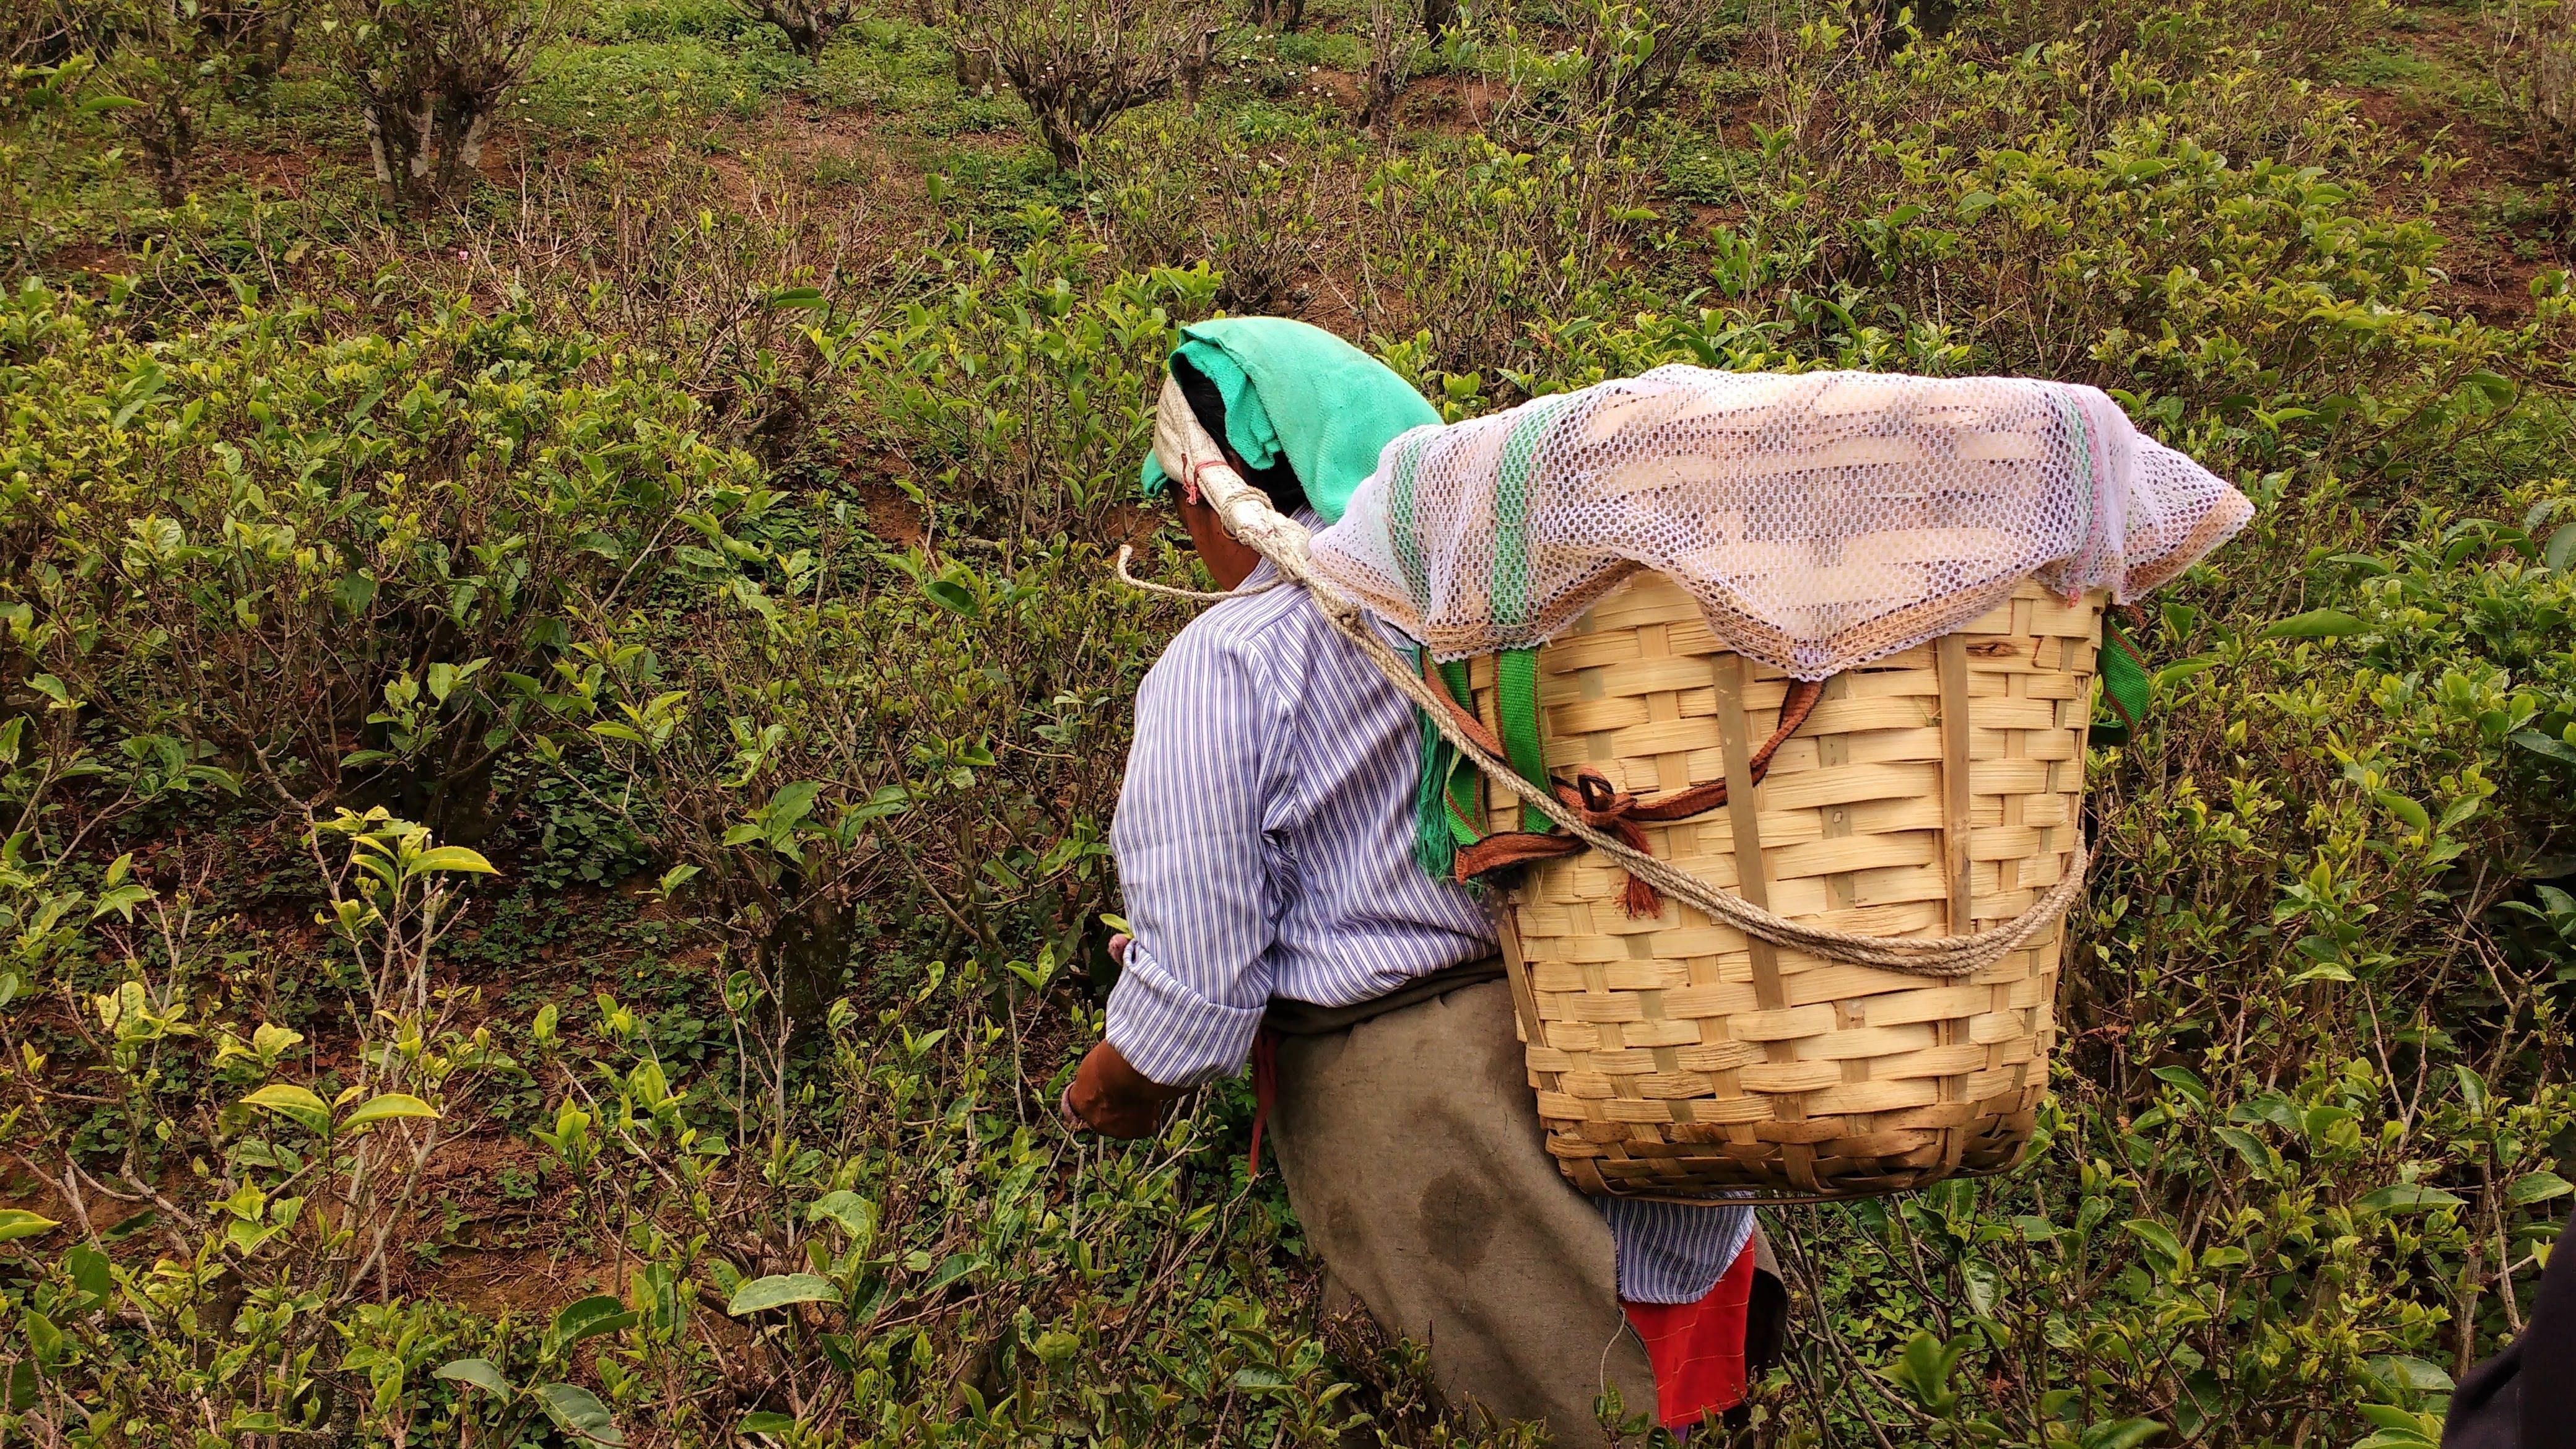 Darjeeling Tea worker